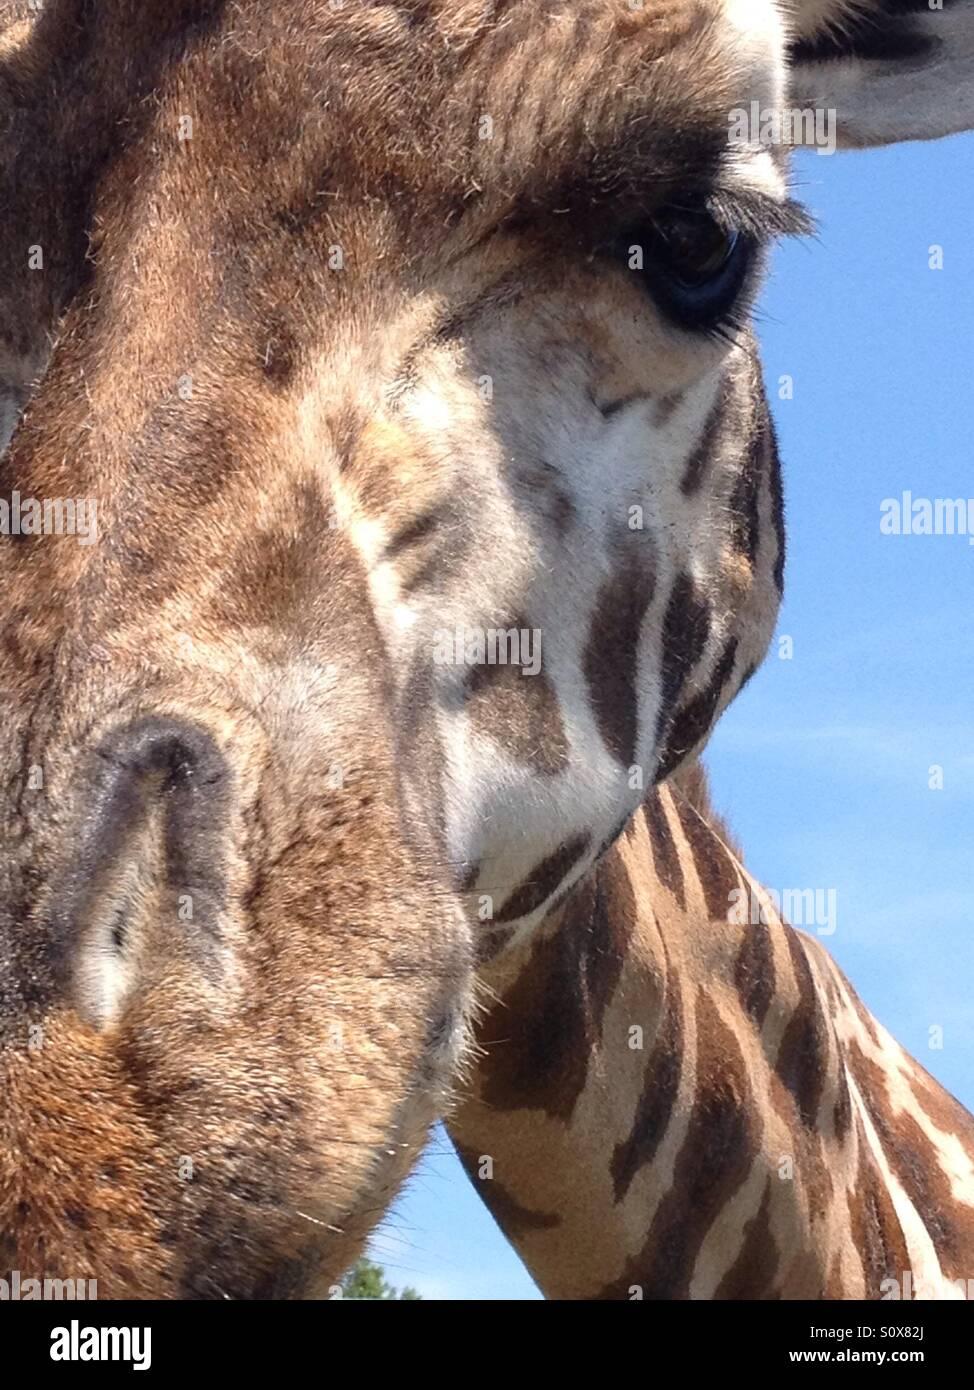 Cara de jirafa Imagen De Stock